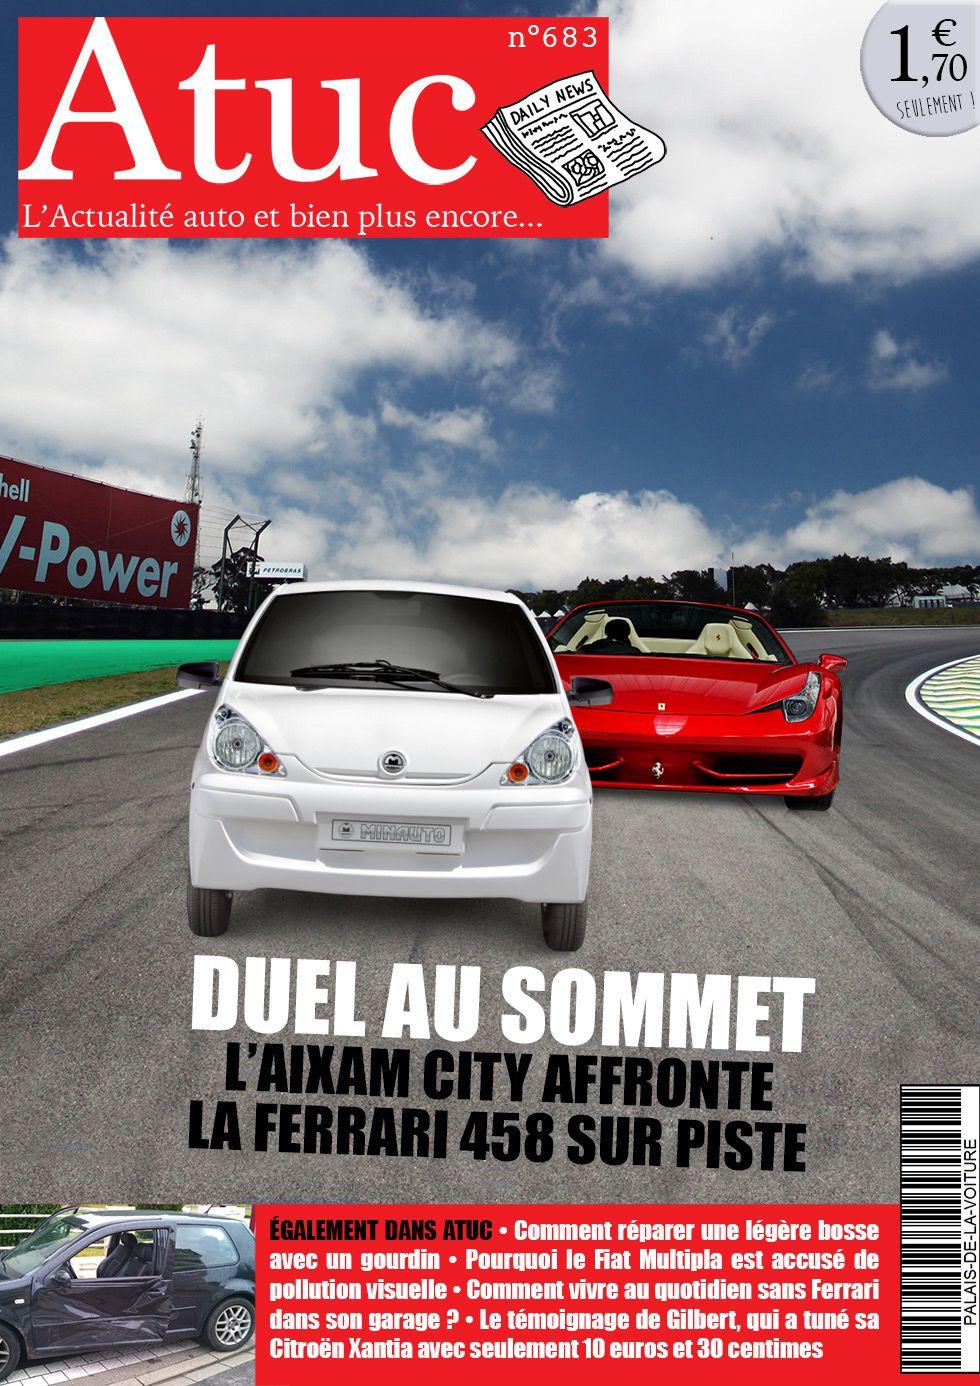 Atuc n°683 • L'Aixam City affronte la Ferrari 458 Italia dans un duel au sommet